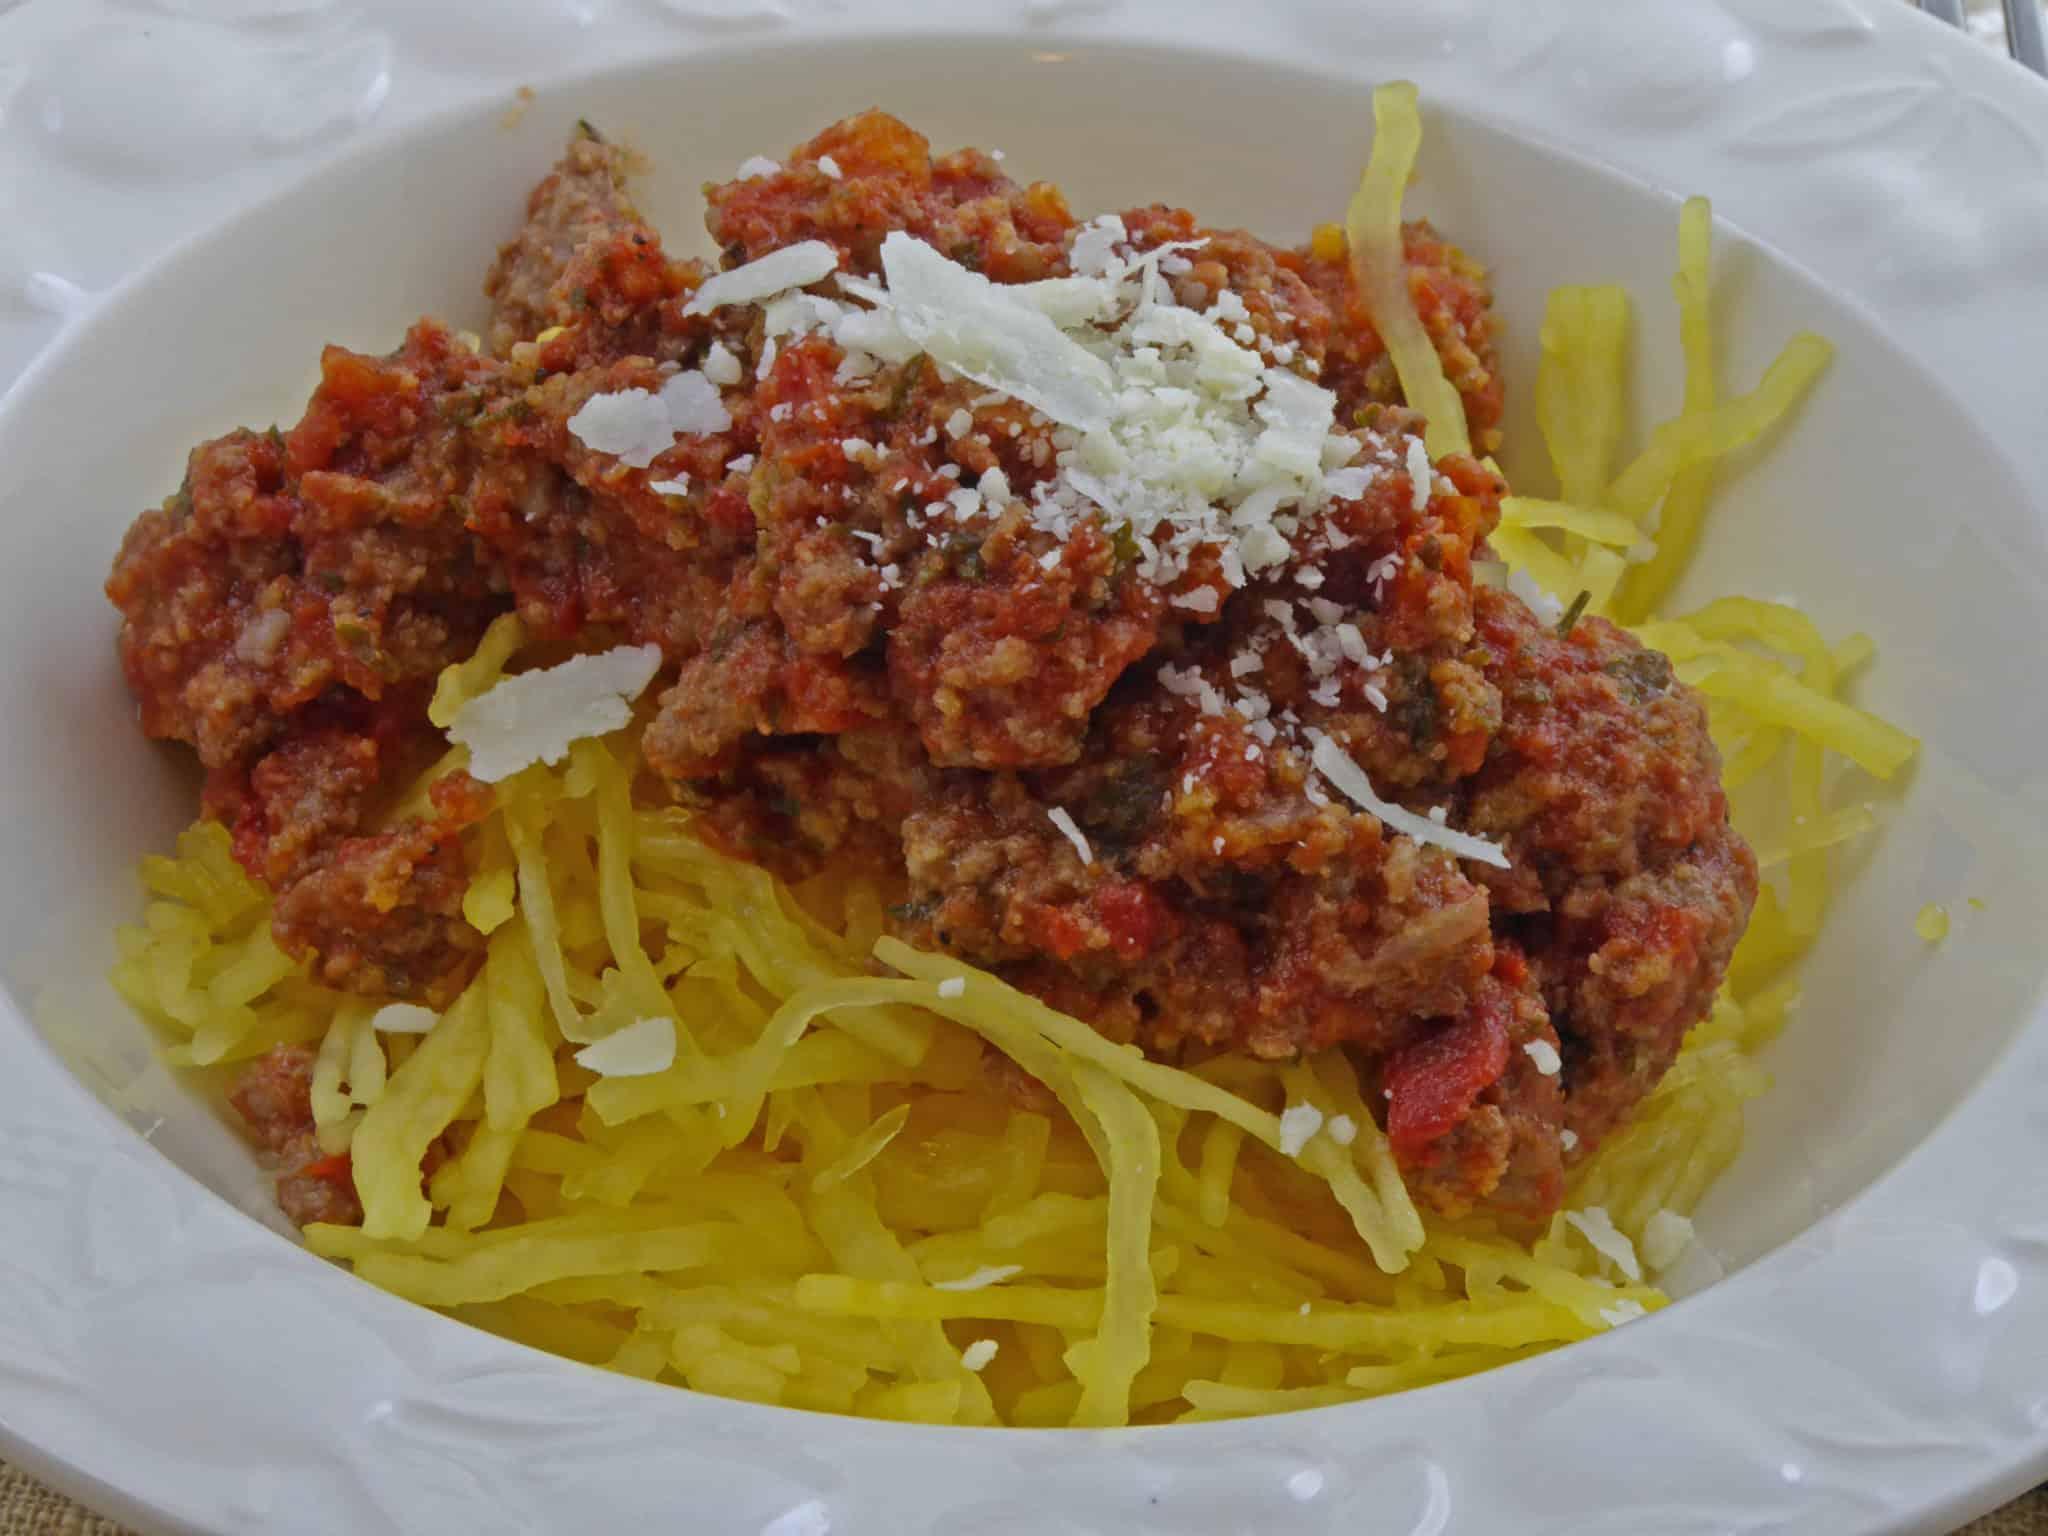 Keto Lasagna Stuffed Spaghetti Squash